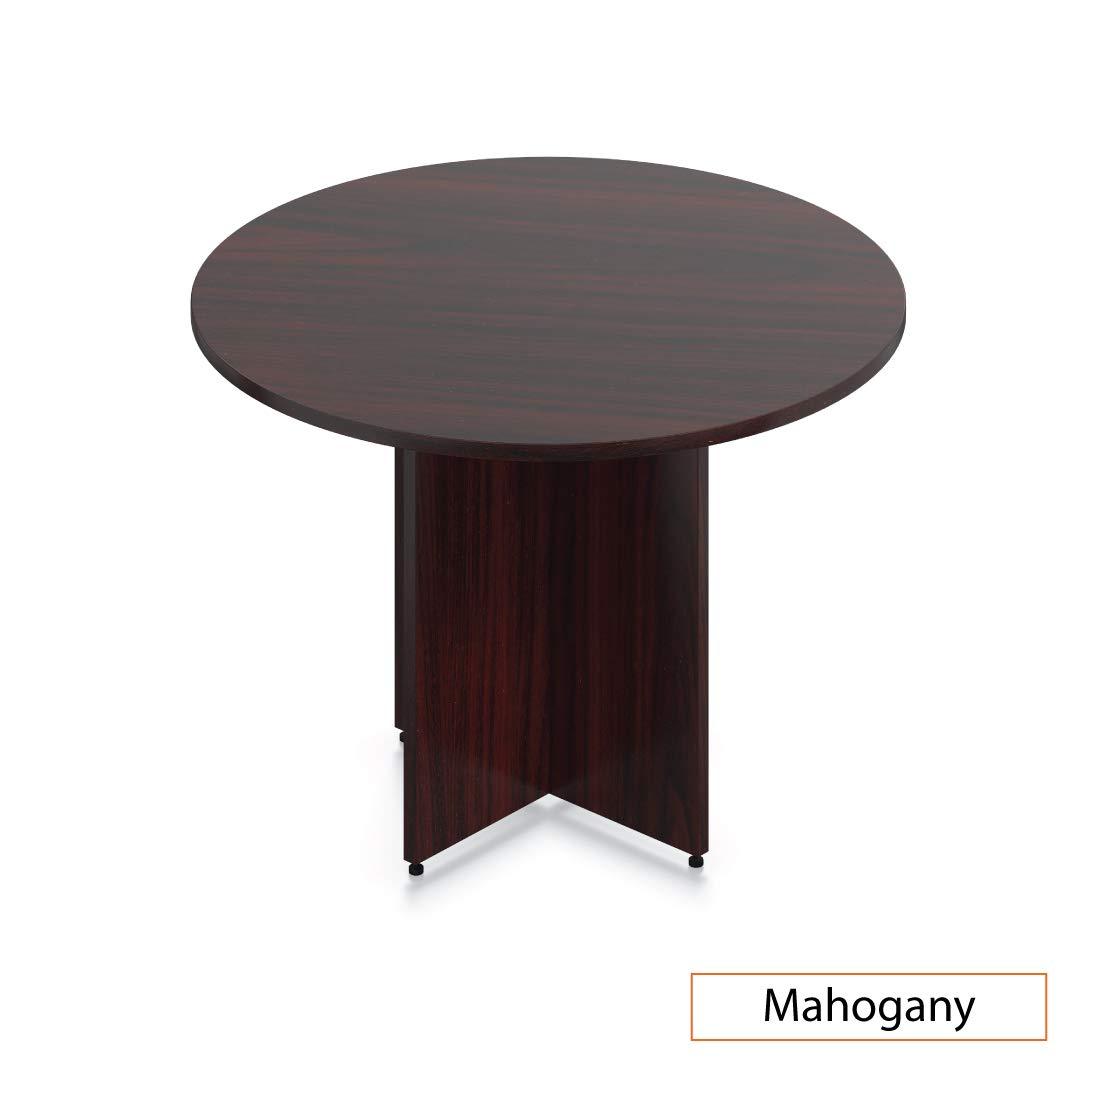 GOF 42'' Round Table (42W x 42D x 29.5H), Cherry, Espresso, Mahogany, Walnut (Mahogany) by GOF (Image #1)